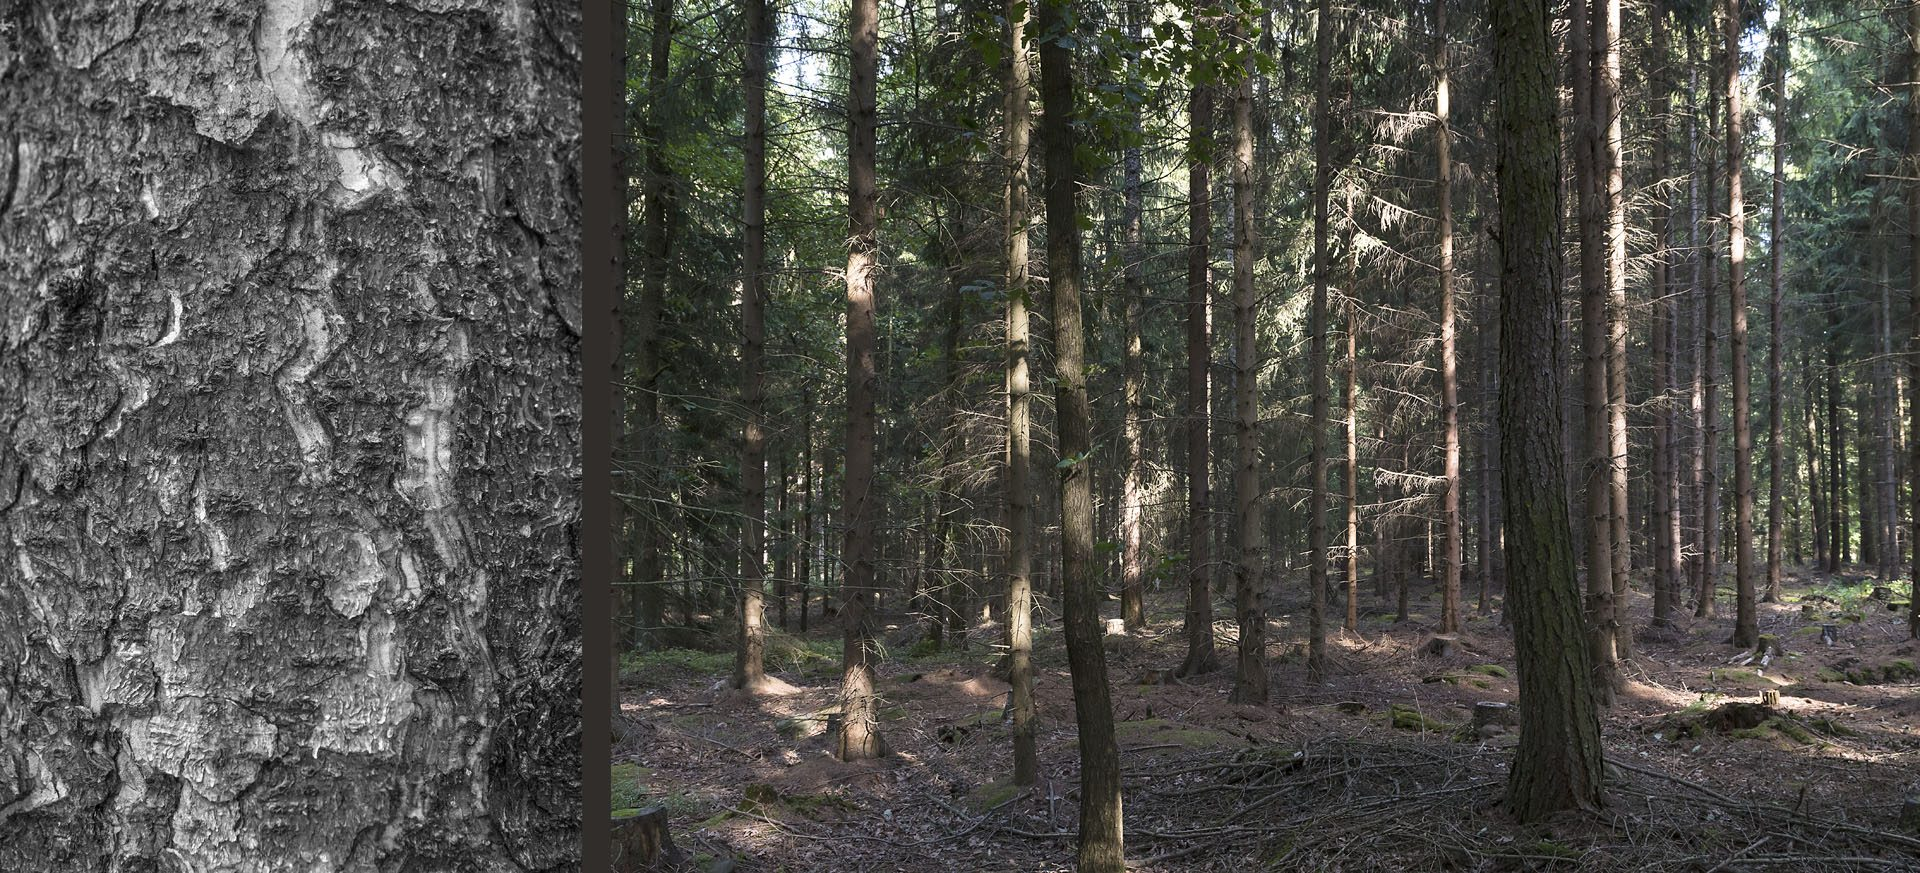 WaldRindenDoppel Tannen II • Lambda-Print auf KODAK Pro Endura, Alu-Dibond®, 110 x 50 cm, gerahmt als Art-Box • Auflage: 5 + 2 Artist's Proof